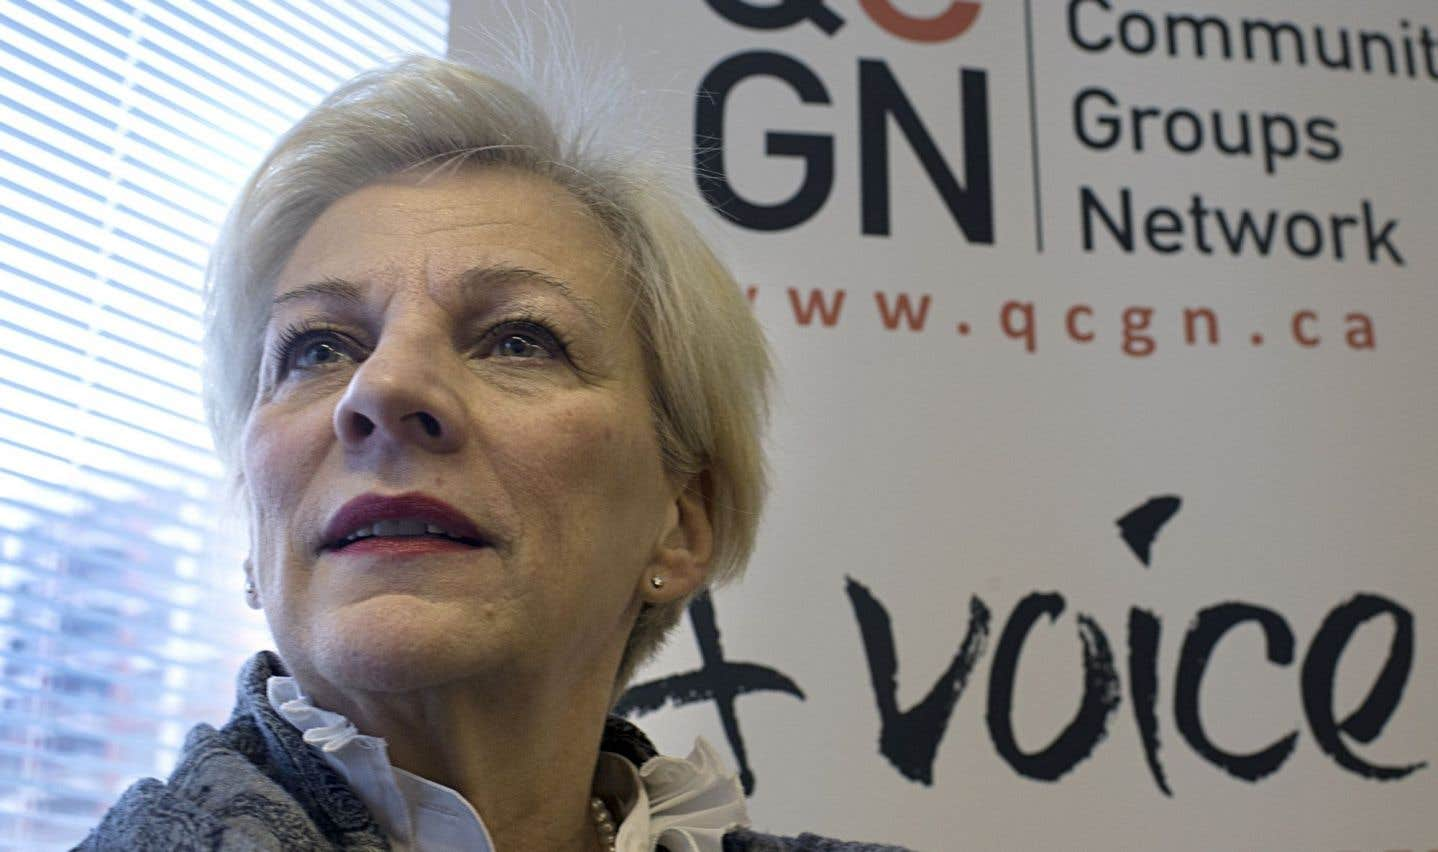 Sylvia Martin-Laforge, la directrice de l'organisme Quebec Community Groups Network.